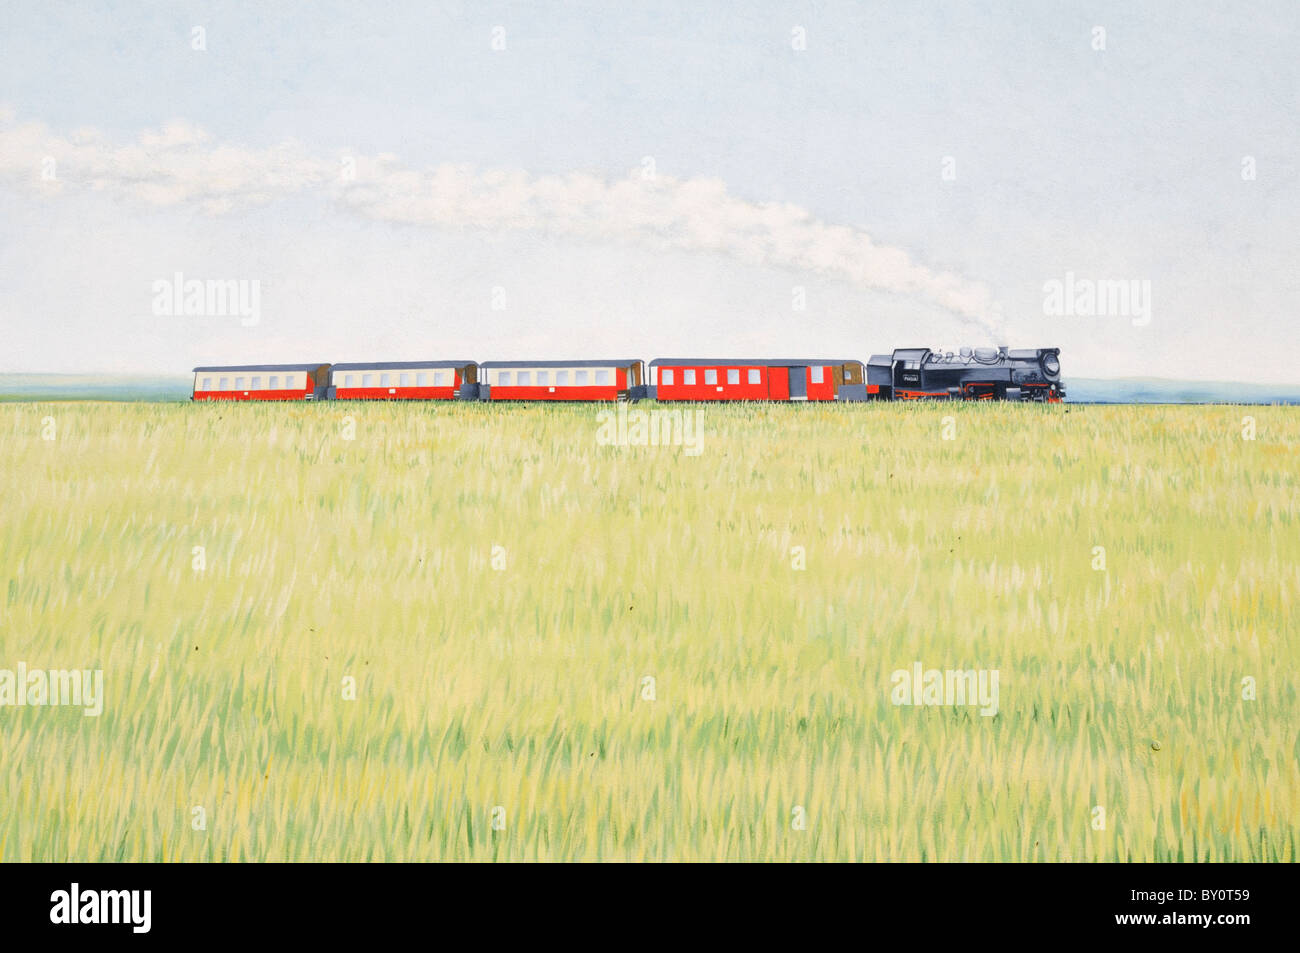 Wandmalerei an einer Hauswand; Motiv Dampflokomotive. - Mural painting on a house wall; motif steam locomotive. Stock Photo